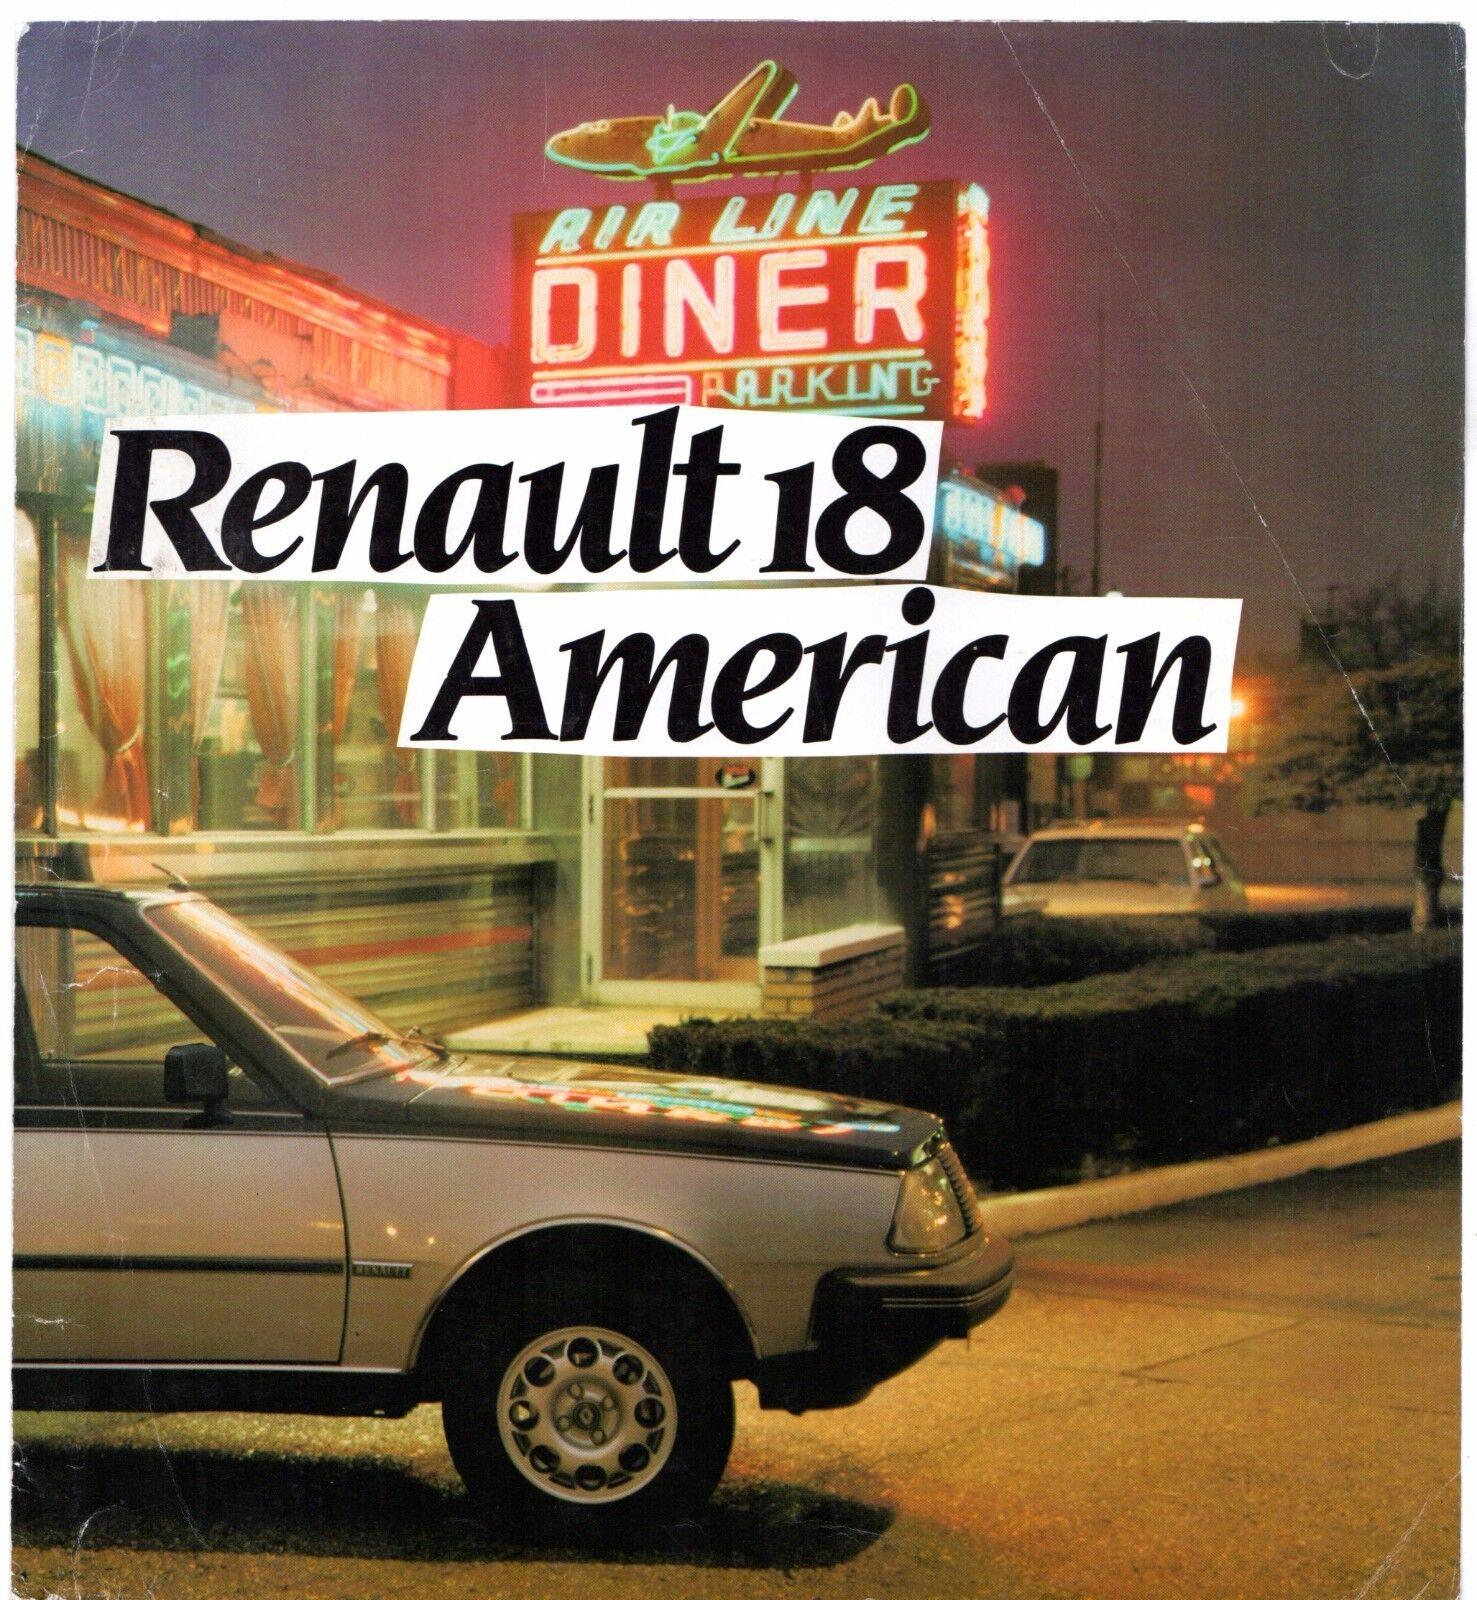 Renault 18 American Limited Edition 1983 Uk Market Sales Brochure For Sale Ebay